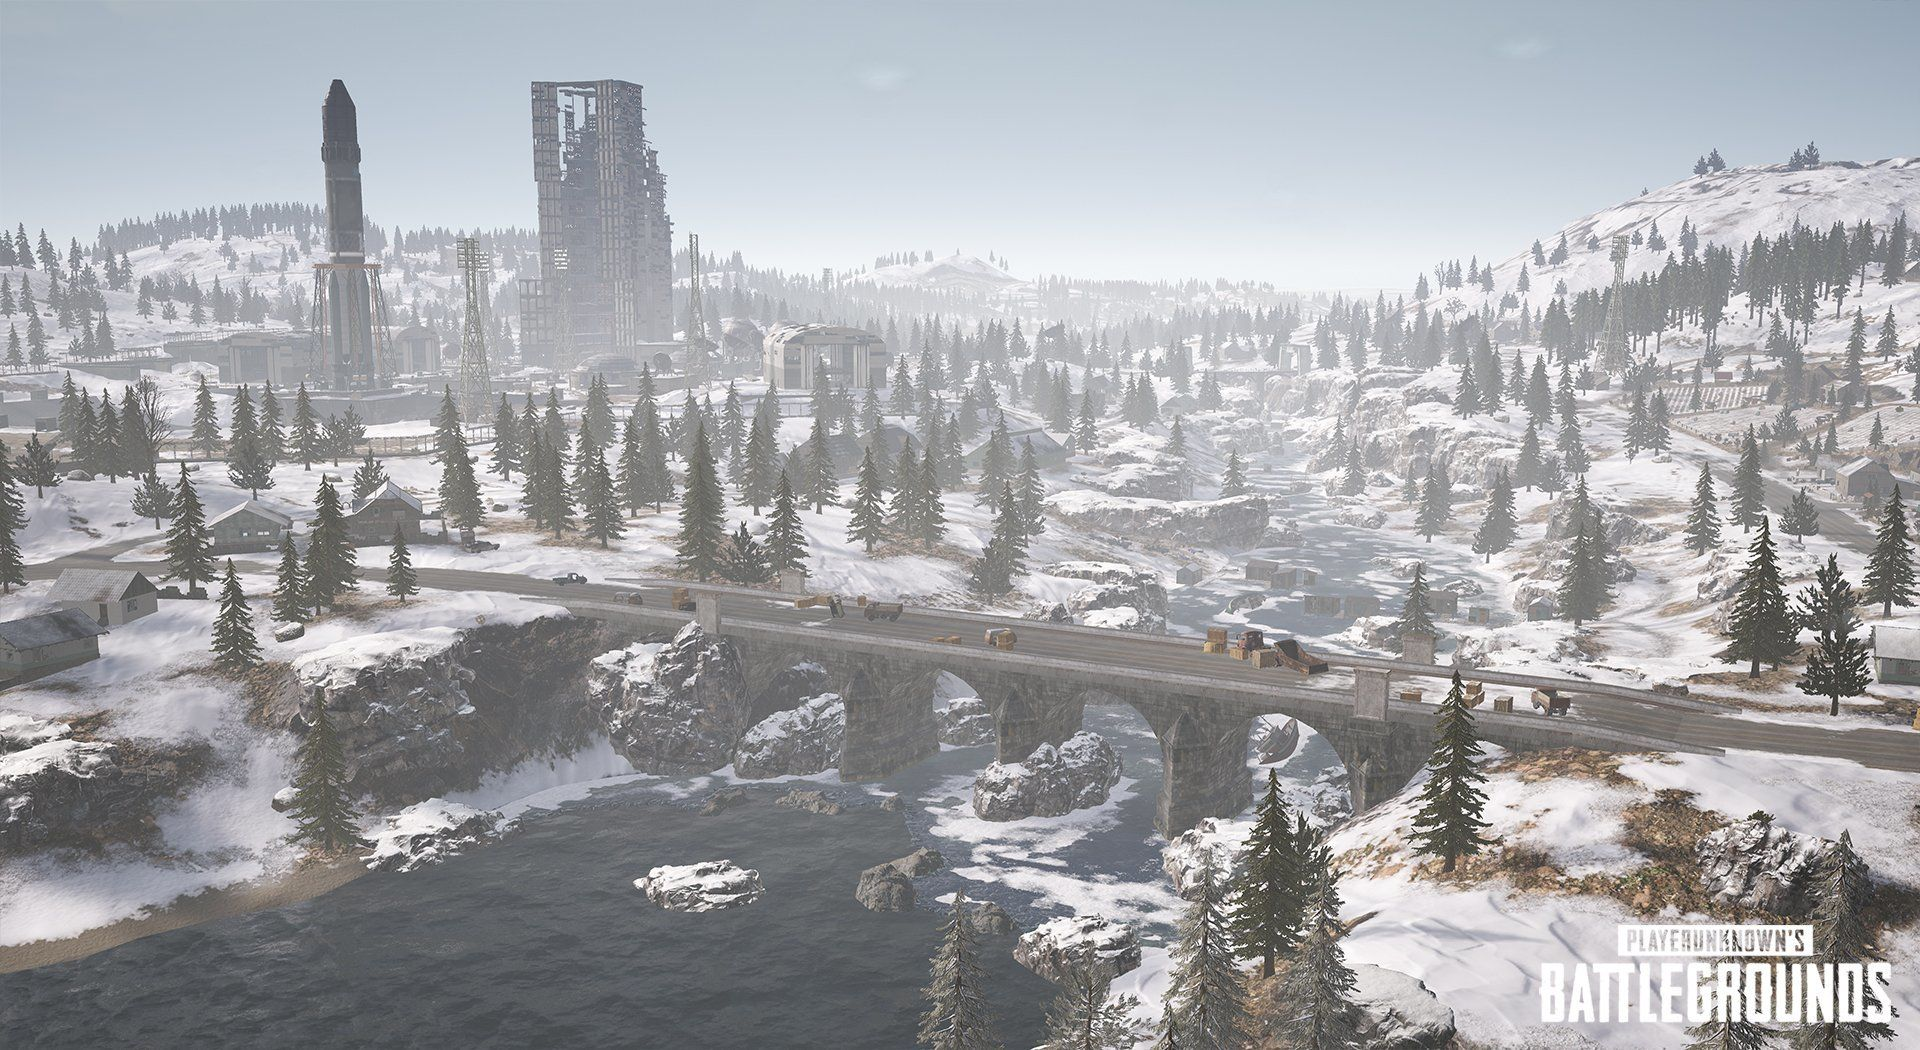 36 Pubg Wallpapers: 'PUBG' Update 24 Adds Vikendi Snow Map, Snowmobile & G36C